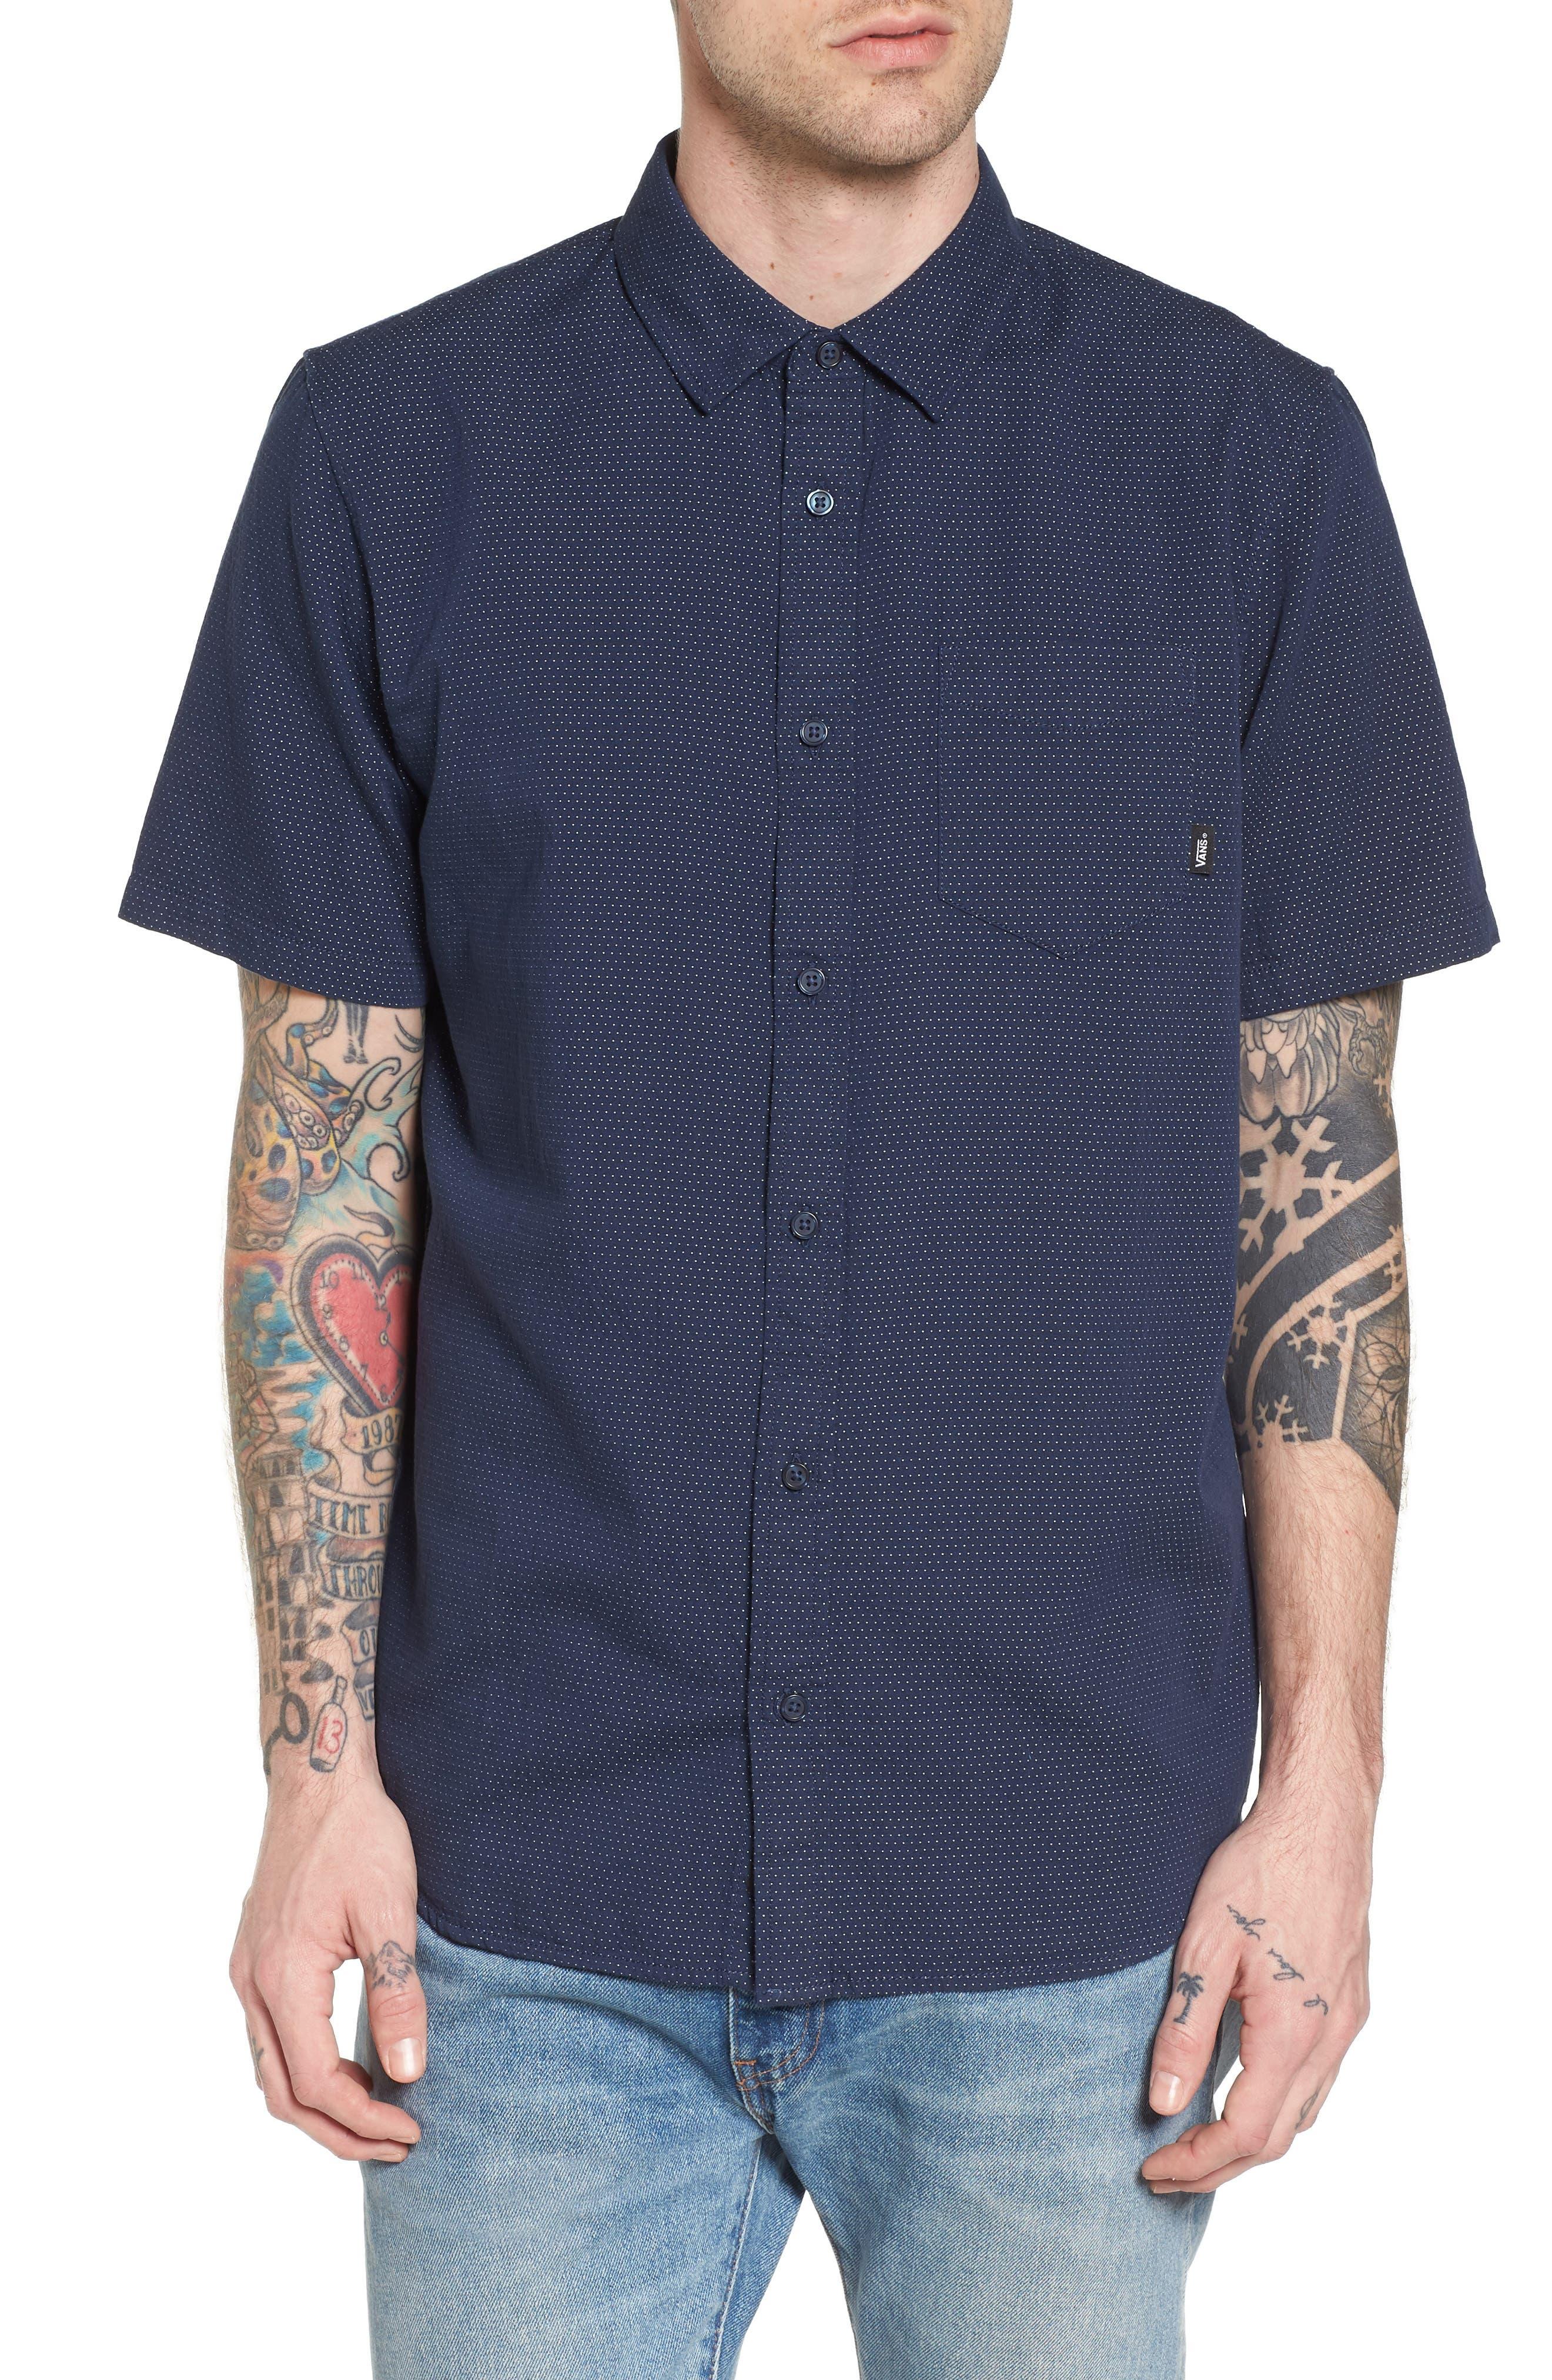 Giddings Short Sleeve Shirt,                             Main thumbnail 1, color,                             401